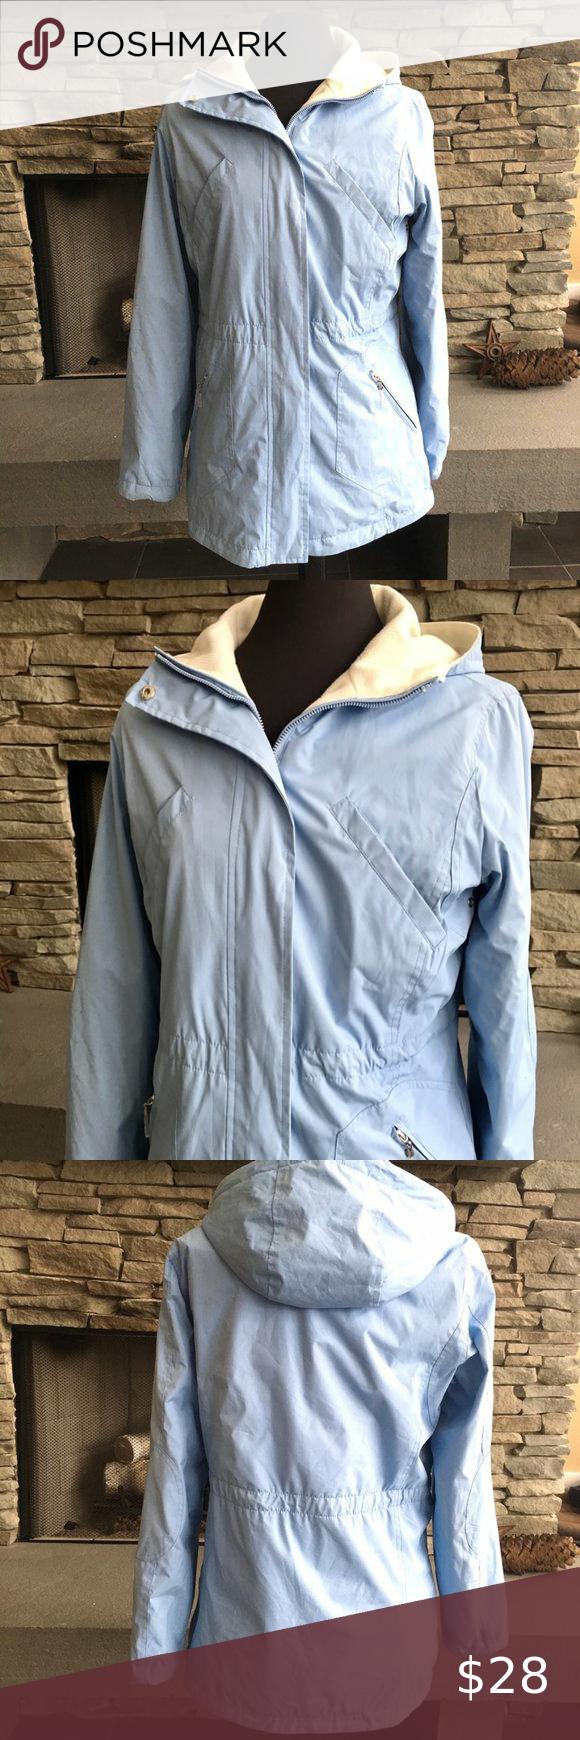 Izod Reversible Jacket Size S Reversible Jackets Jackets For Women Izod [ 1740 x 580 Pixel ]